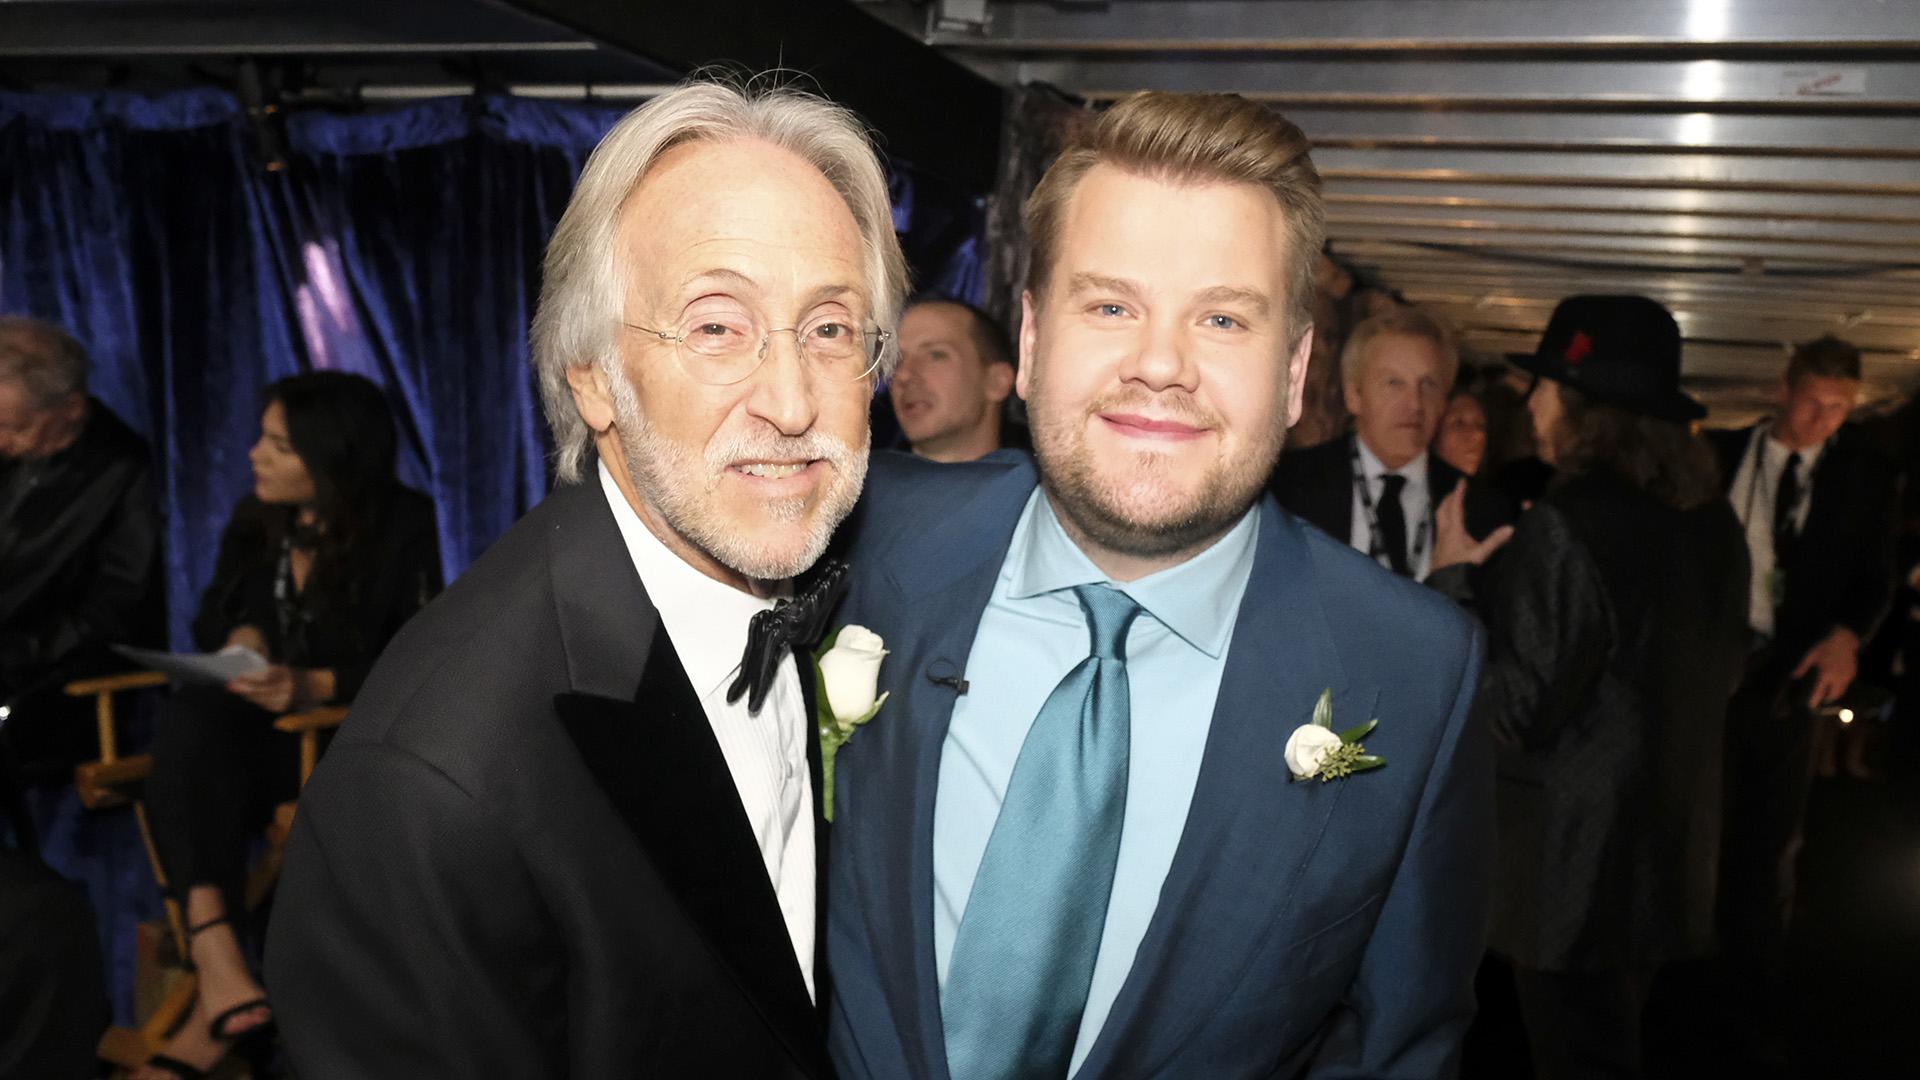 James Corden smiles for the camera with Recording Academy president Neil Portnow.